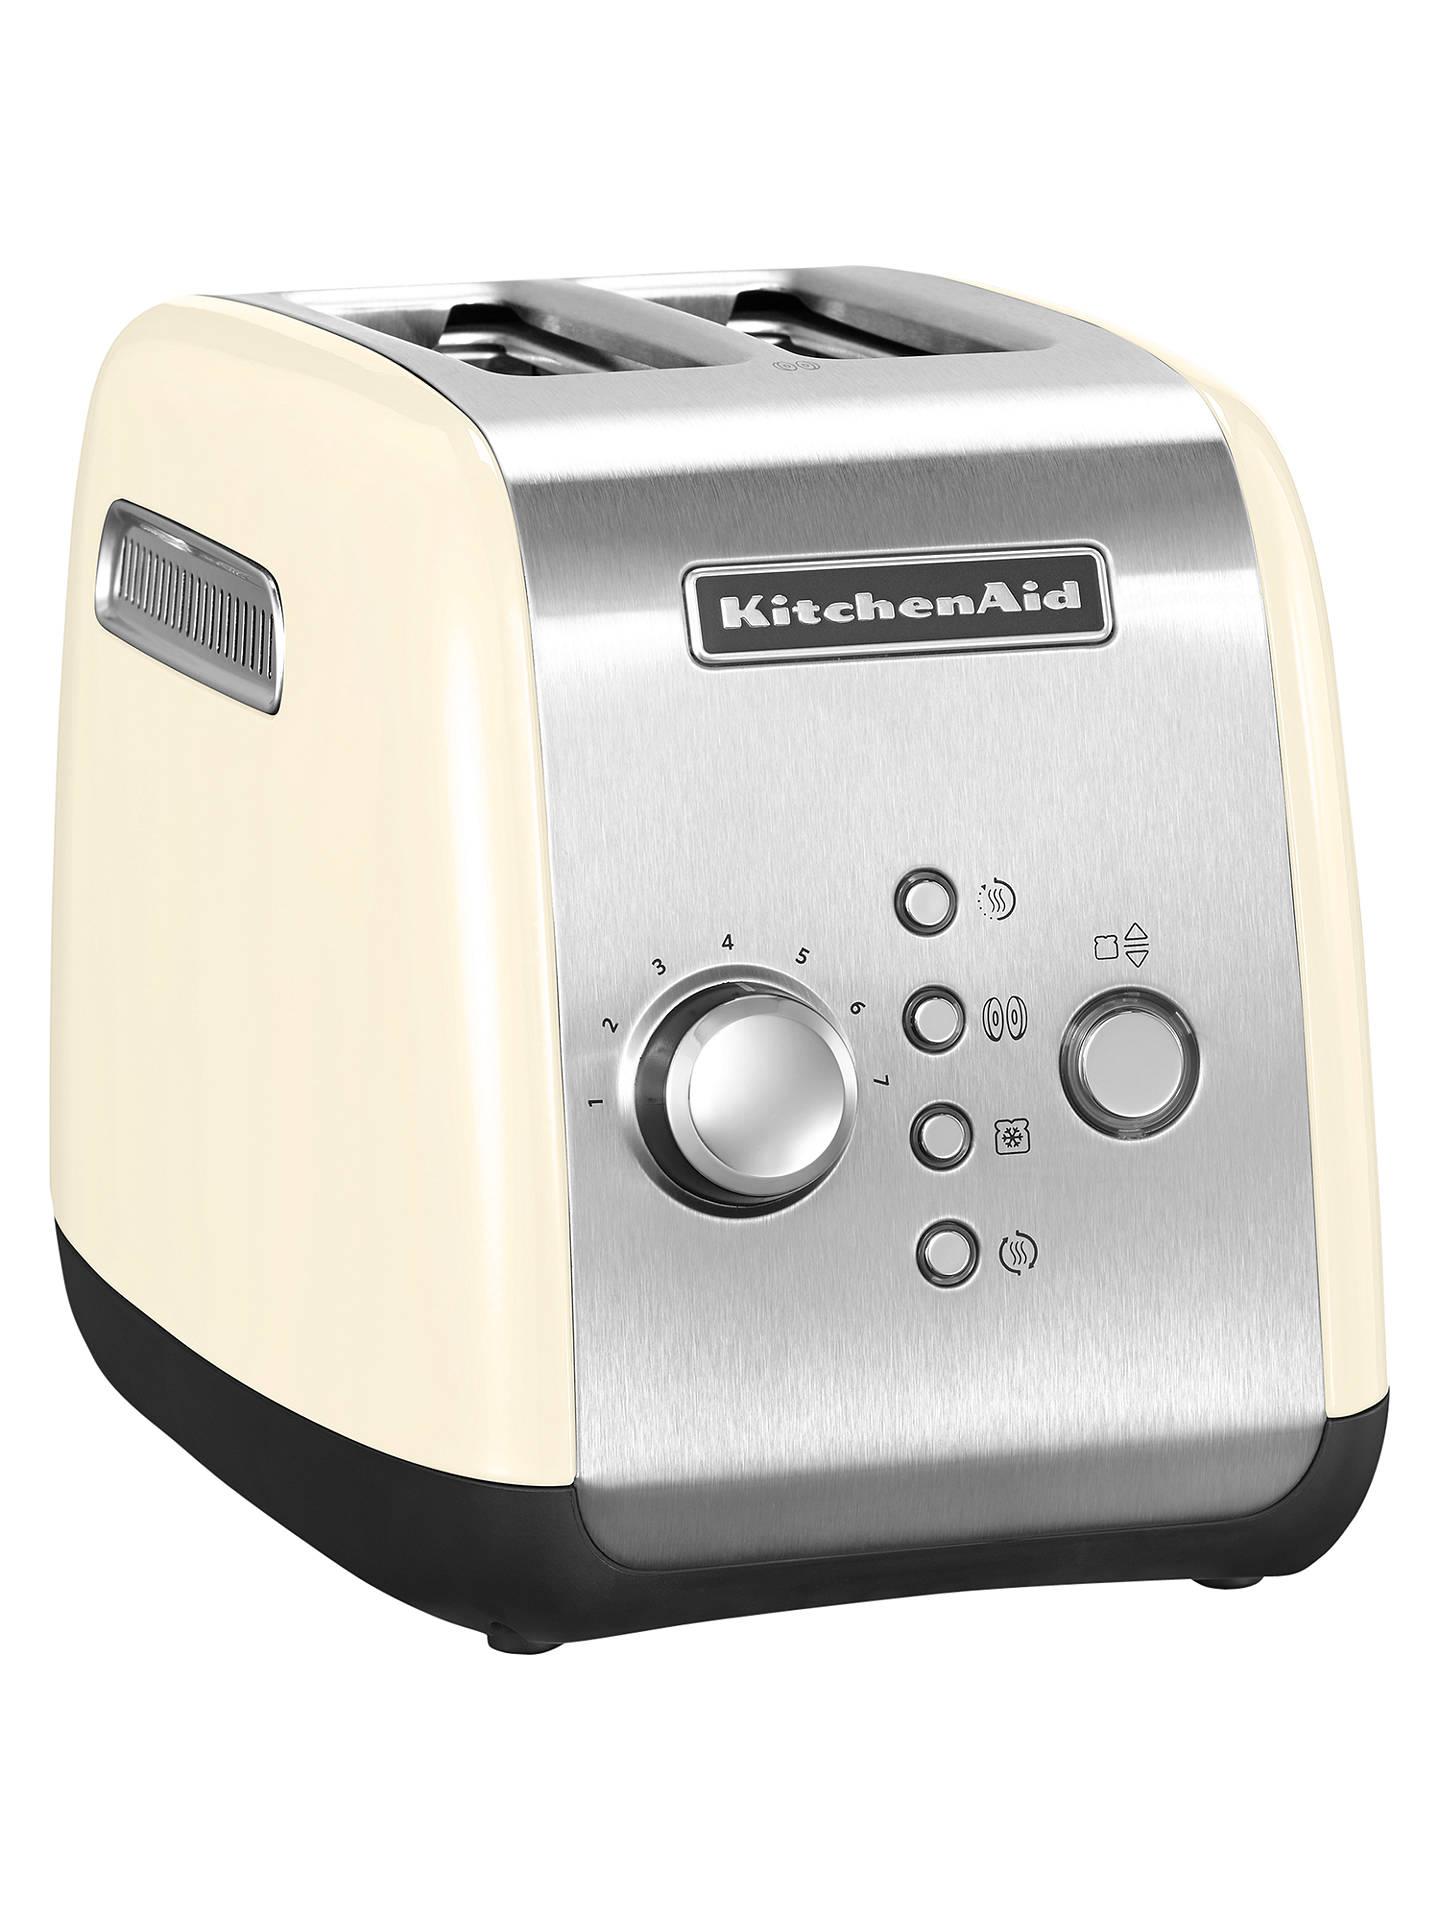 Kitchenaid 2 Slice Toaster At John Lewis Amp Partners